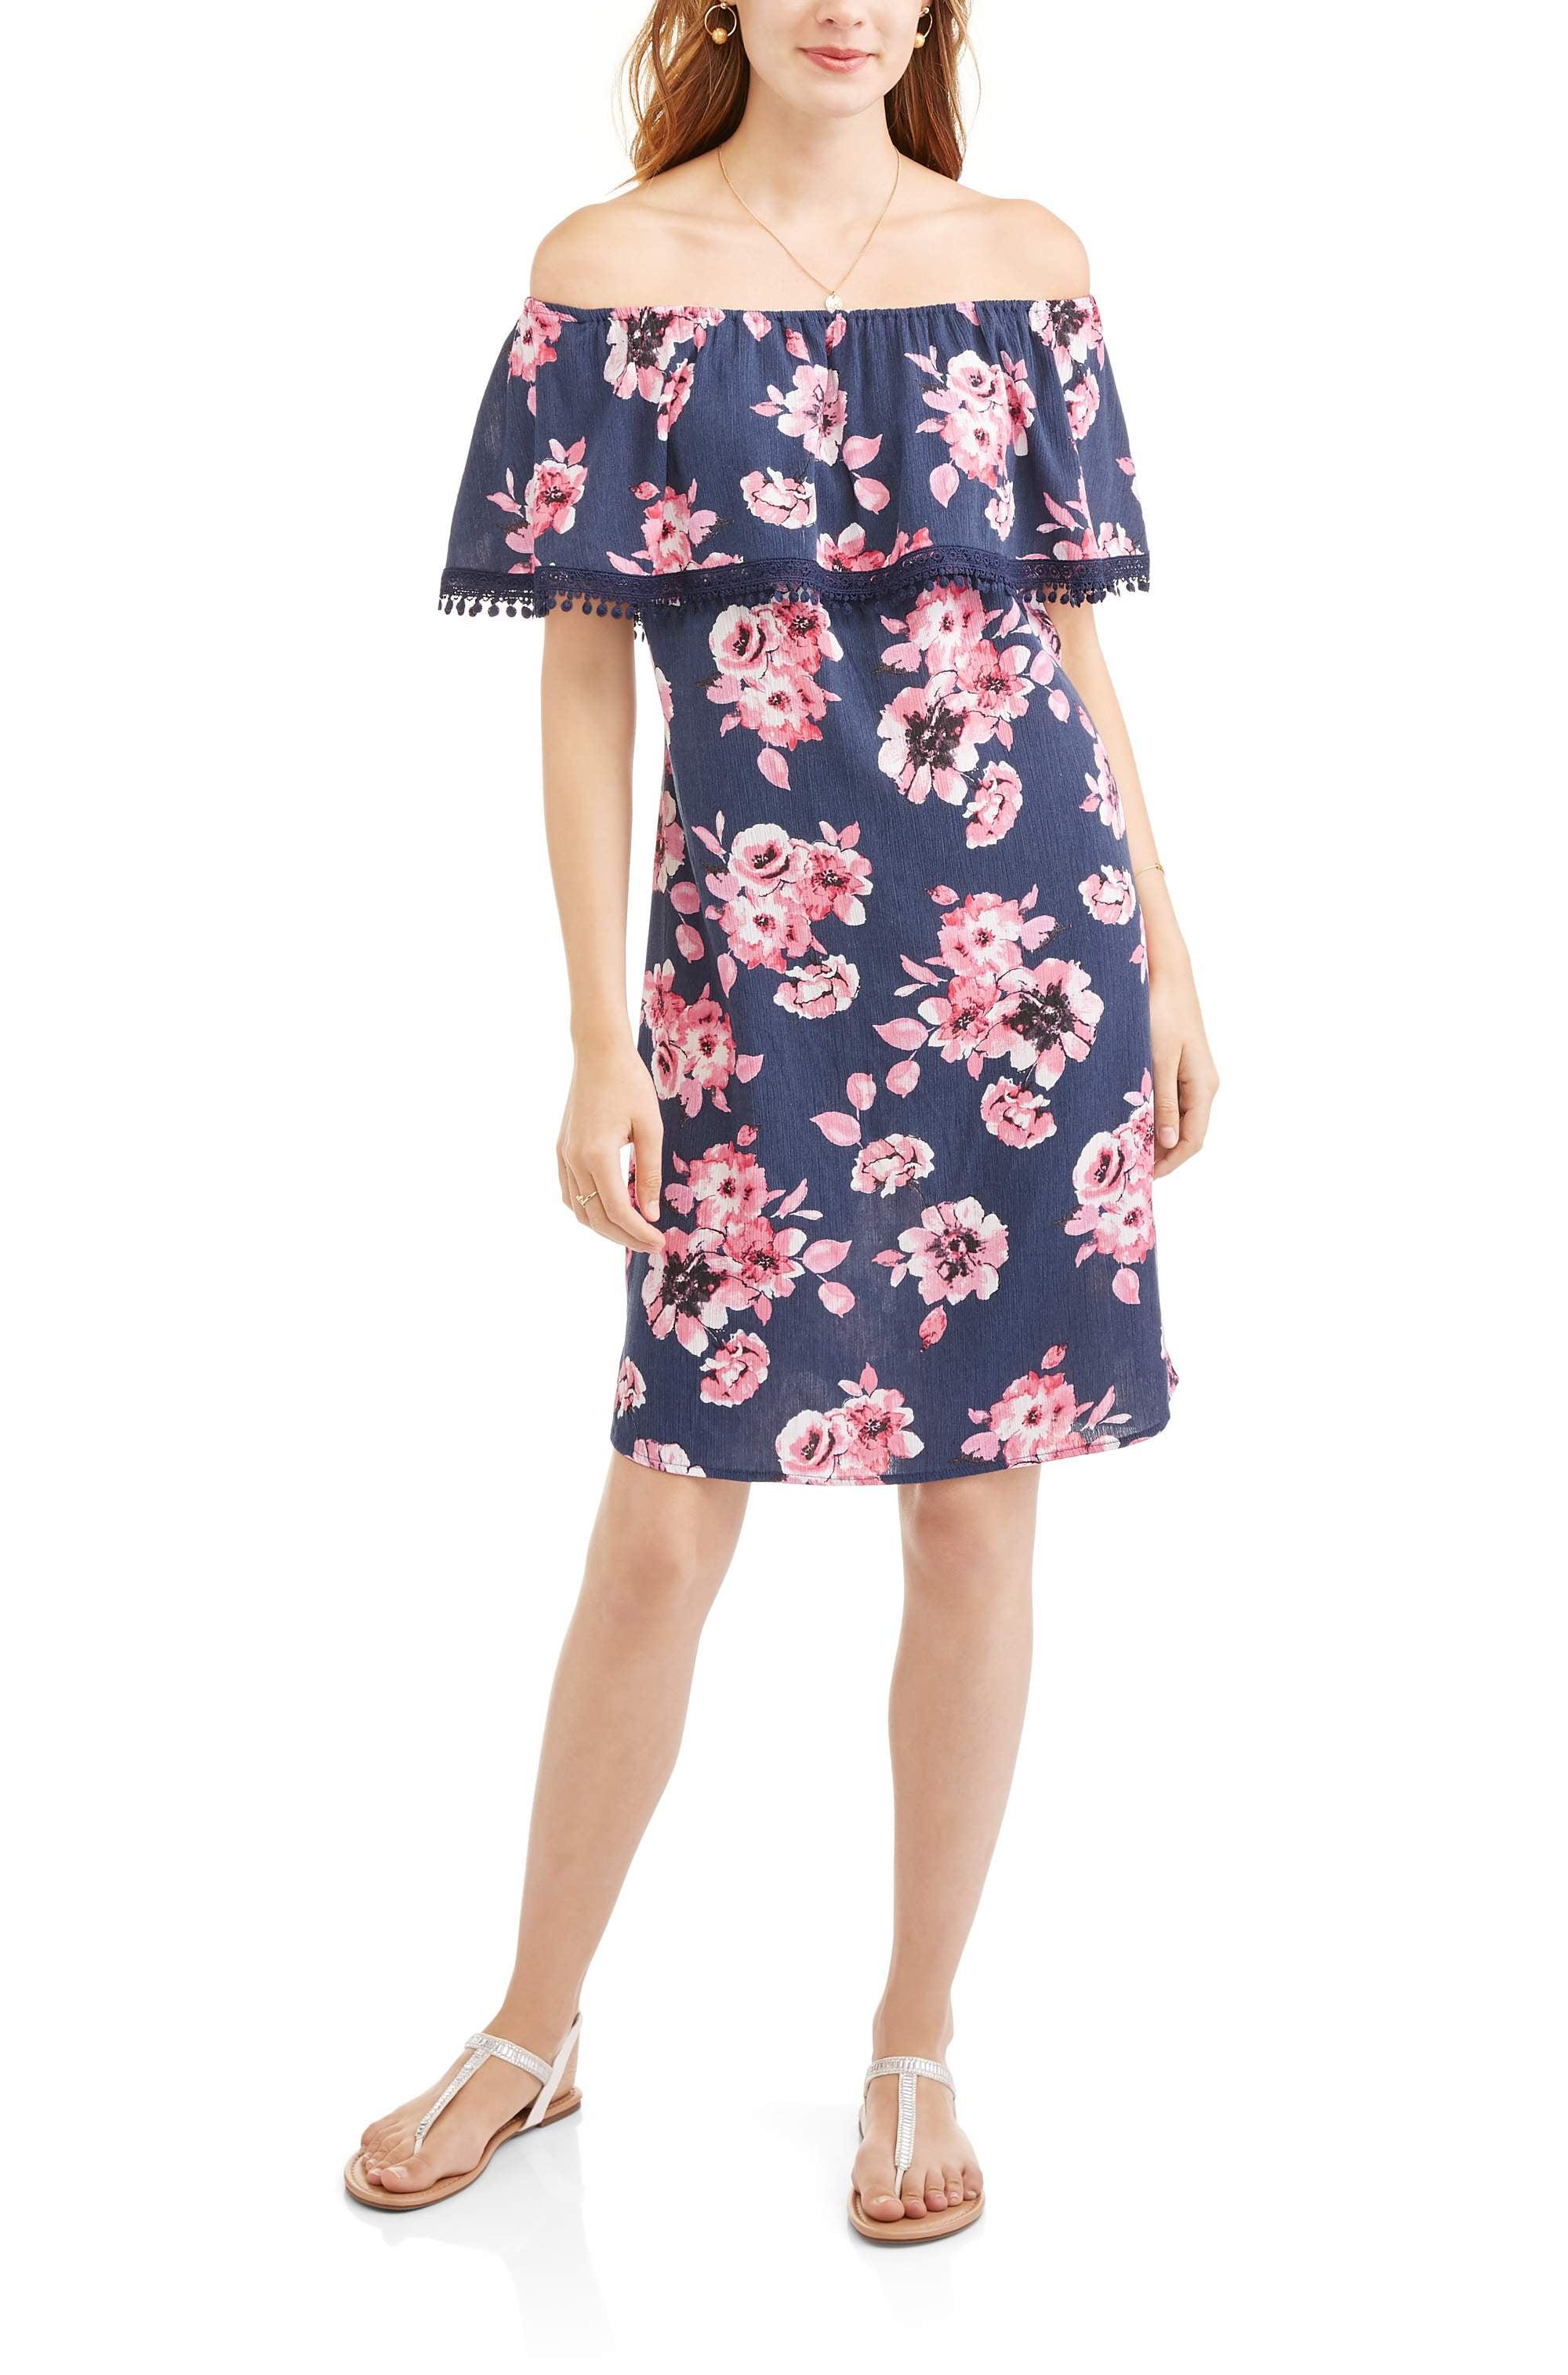 Whoa, Wait Women's Cha Cha Ruffle Dress